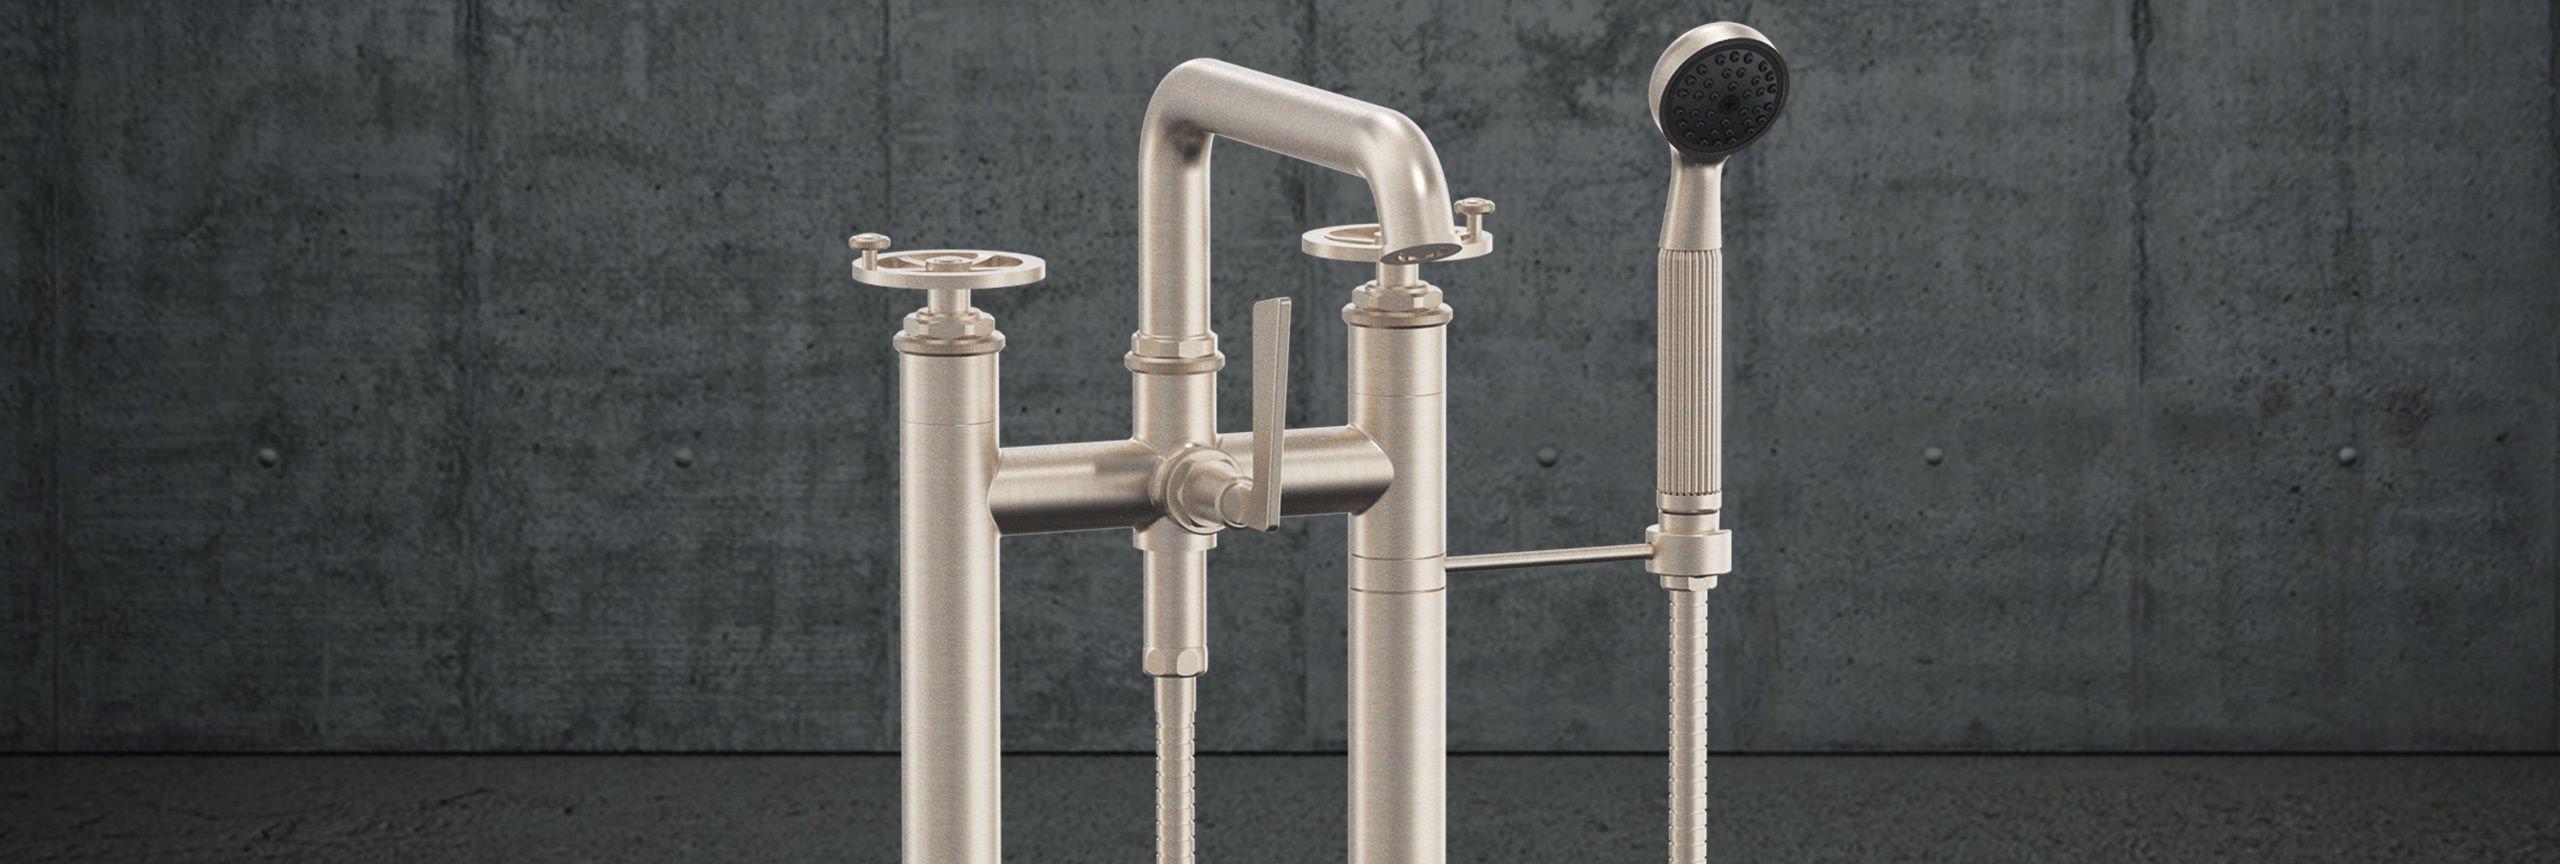 bathroom series Steampunk Bay tub filler with wheel handles